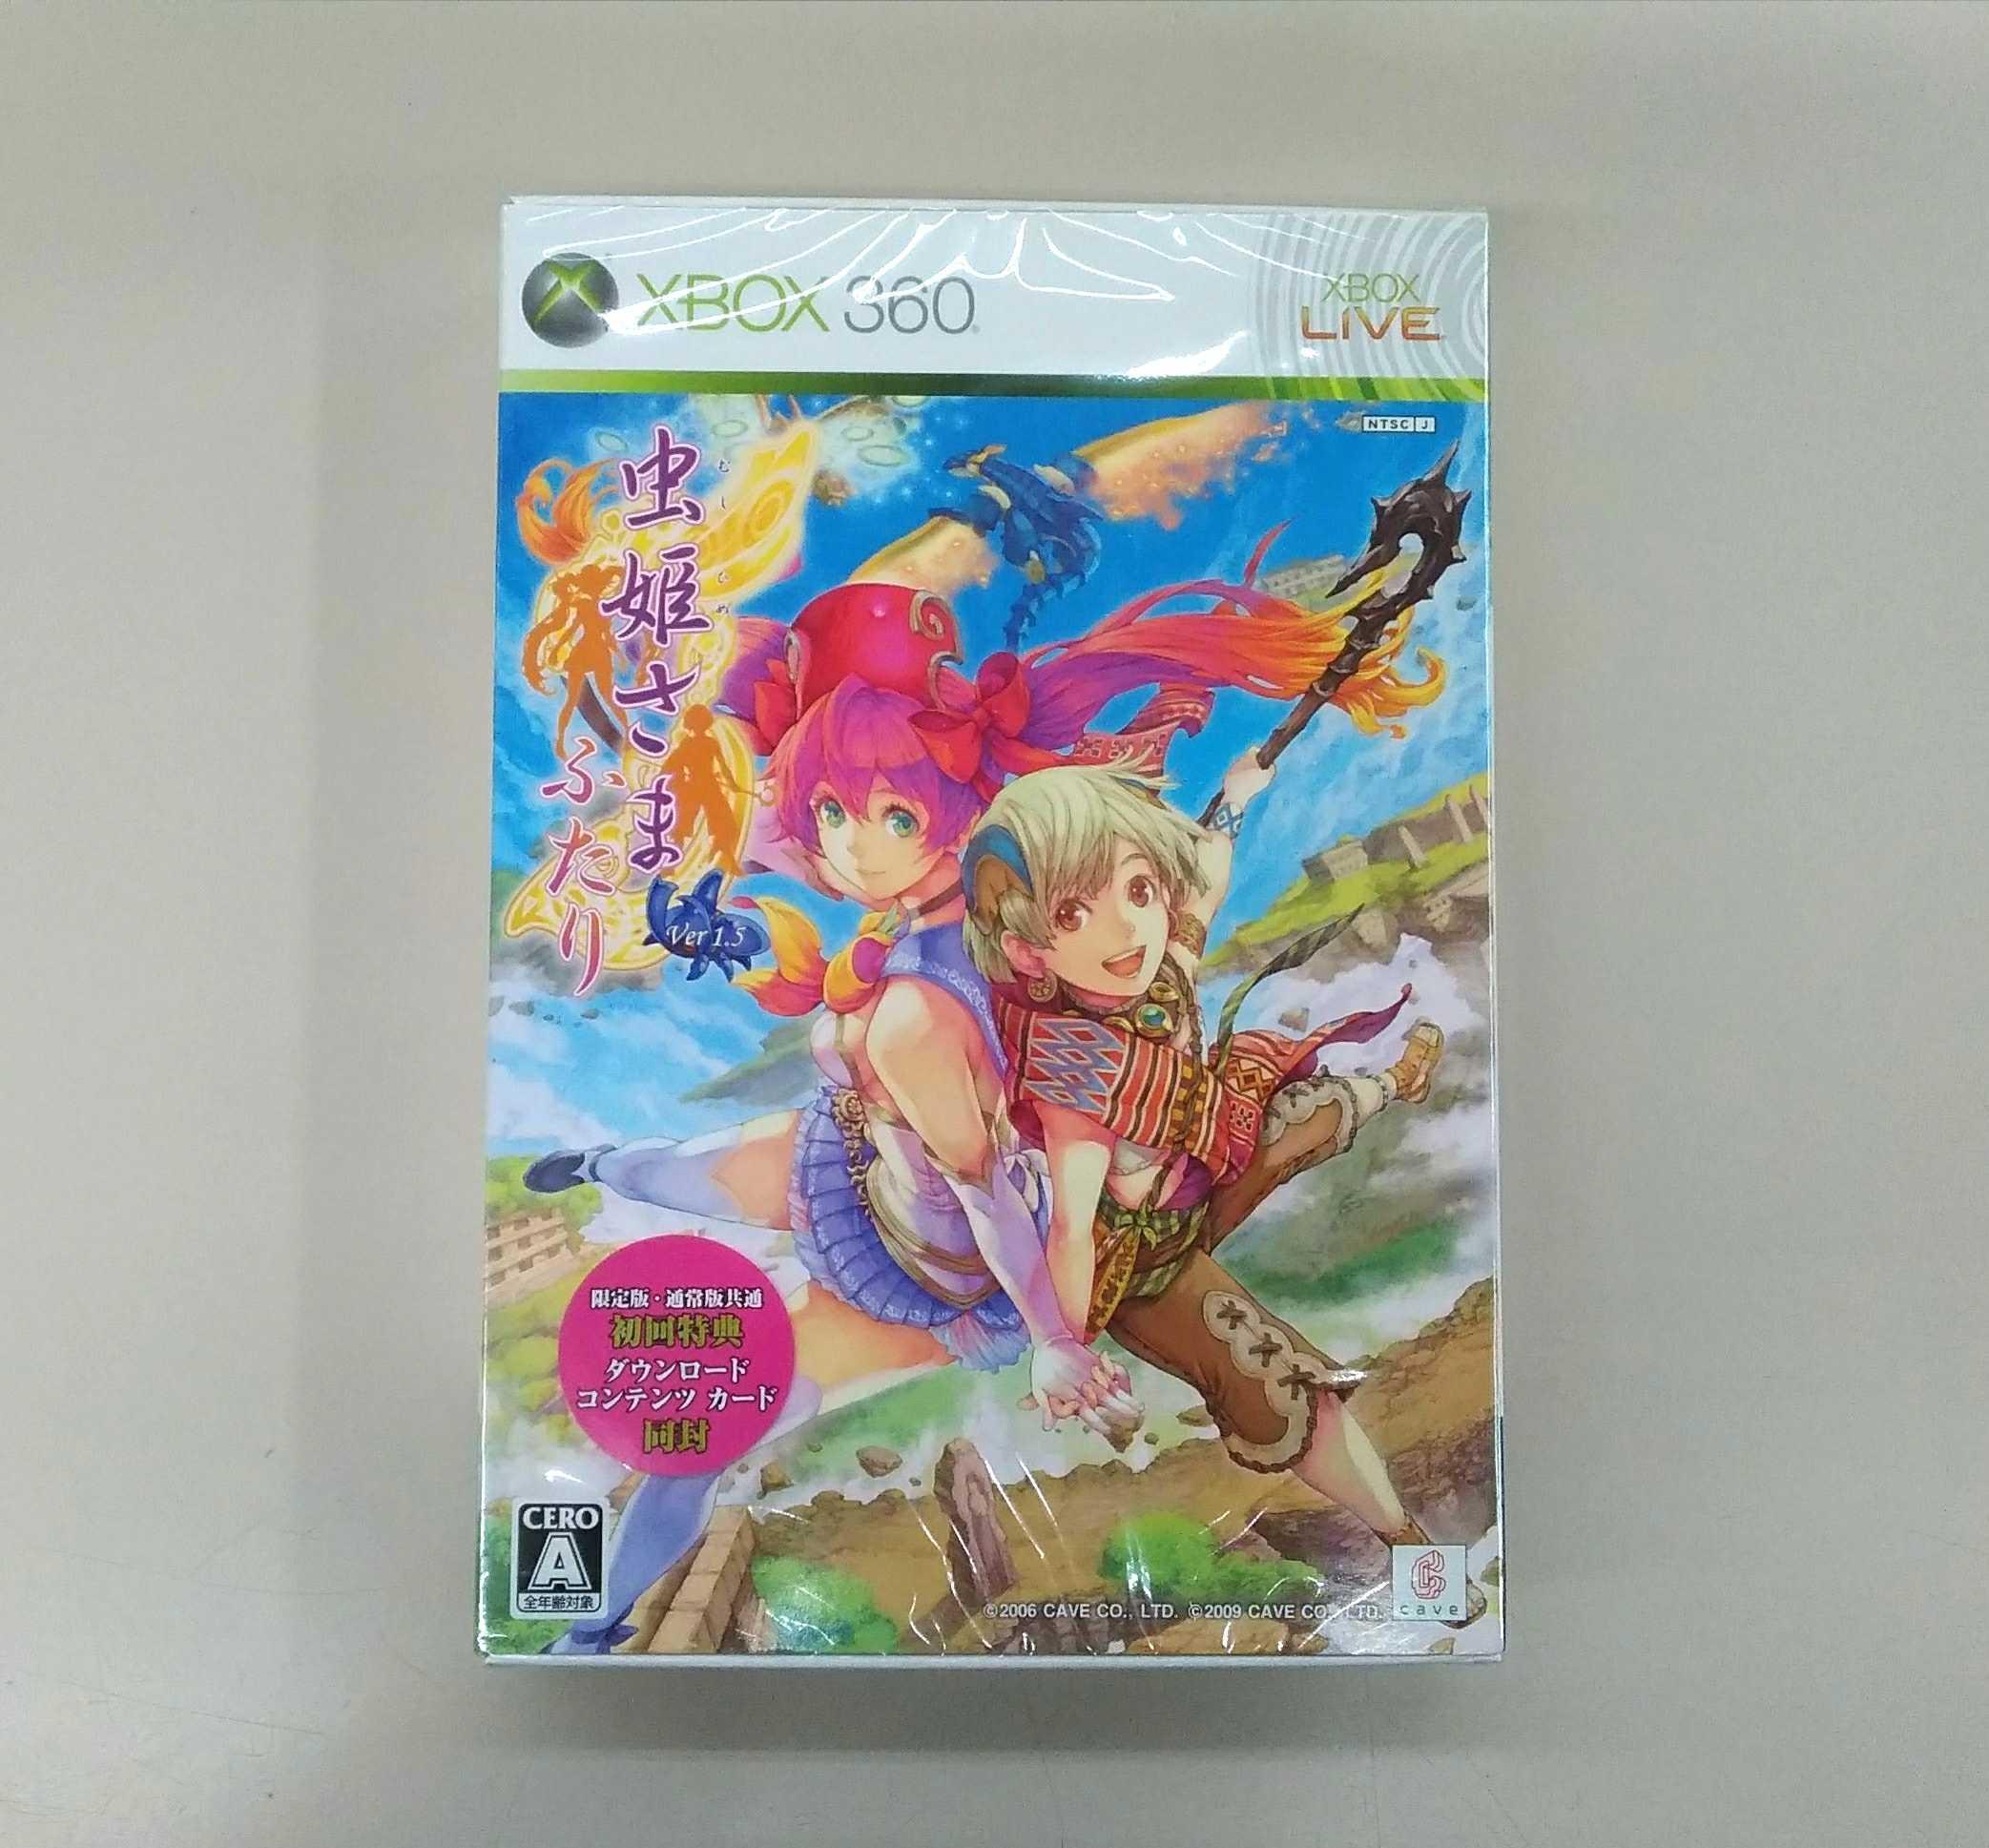 XBOX360ソフト 虫姫さまふたりVER1.5|CAVE